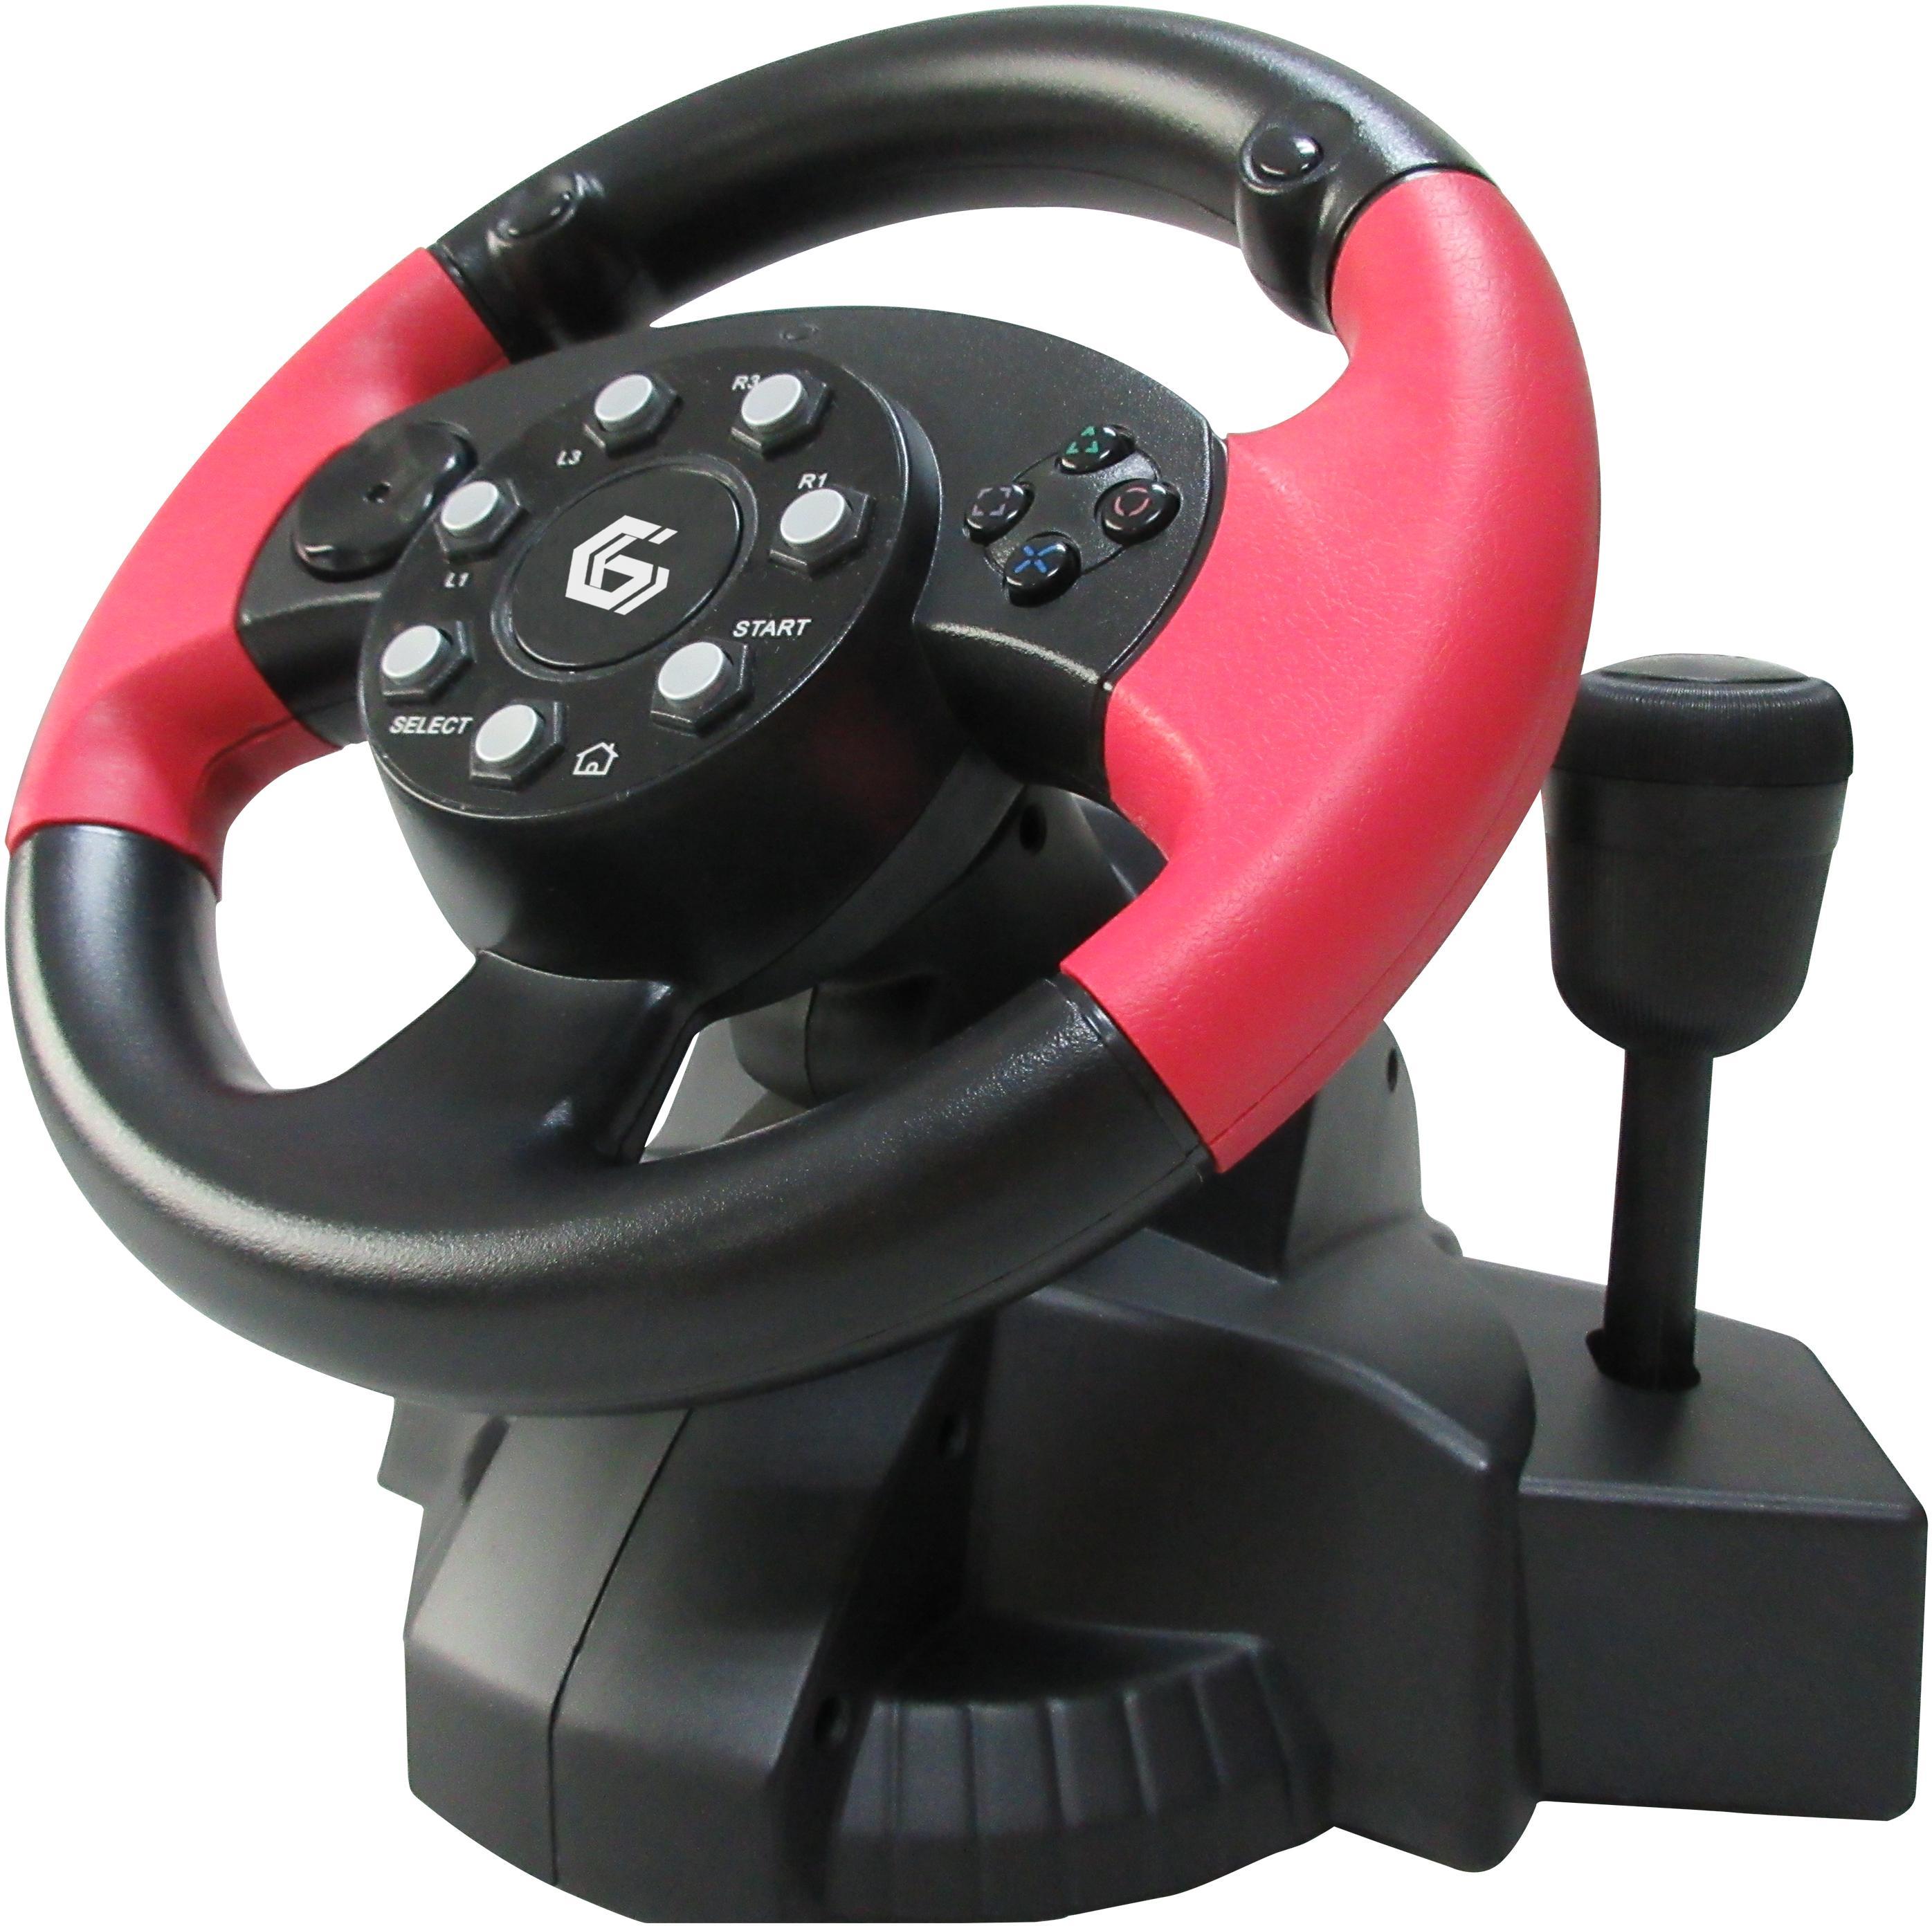 gembird usb vibrating racing wheel pc ps2 ps3. Black Bedroom Furniture Sets. Home Design Ideas